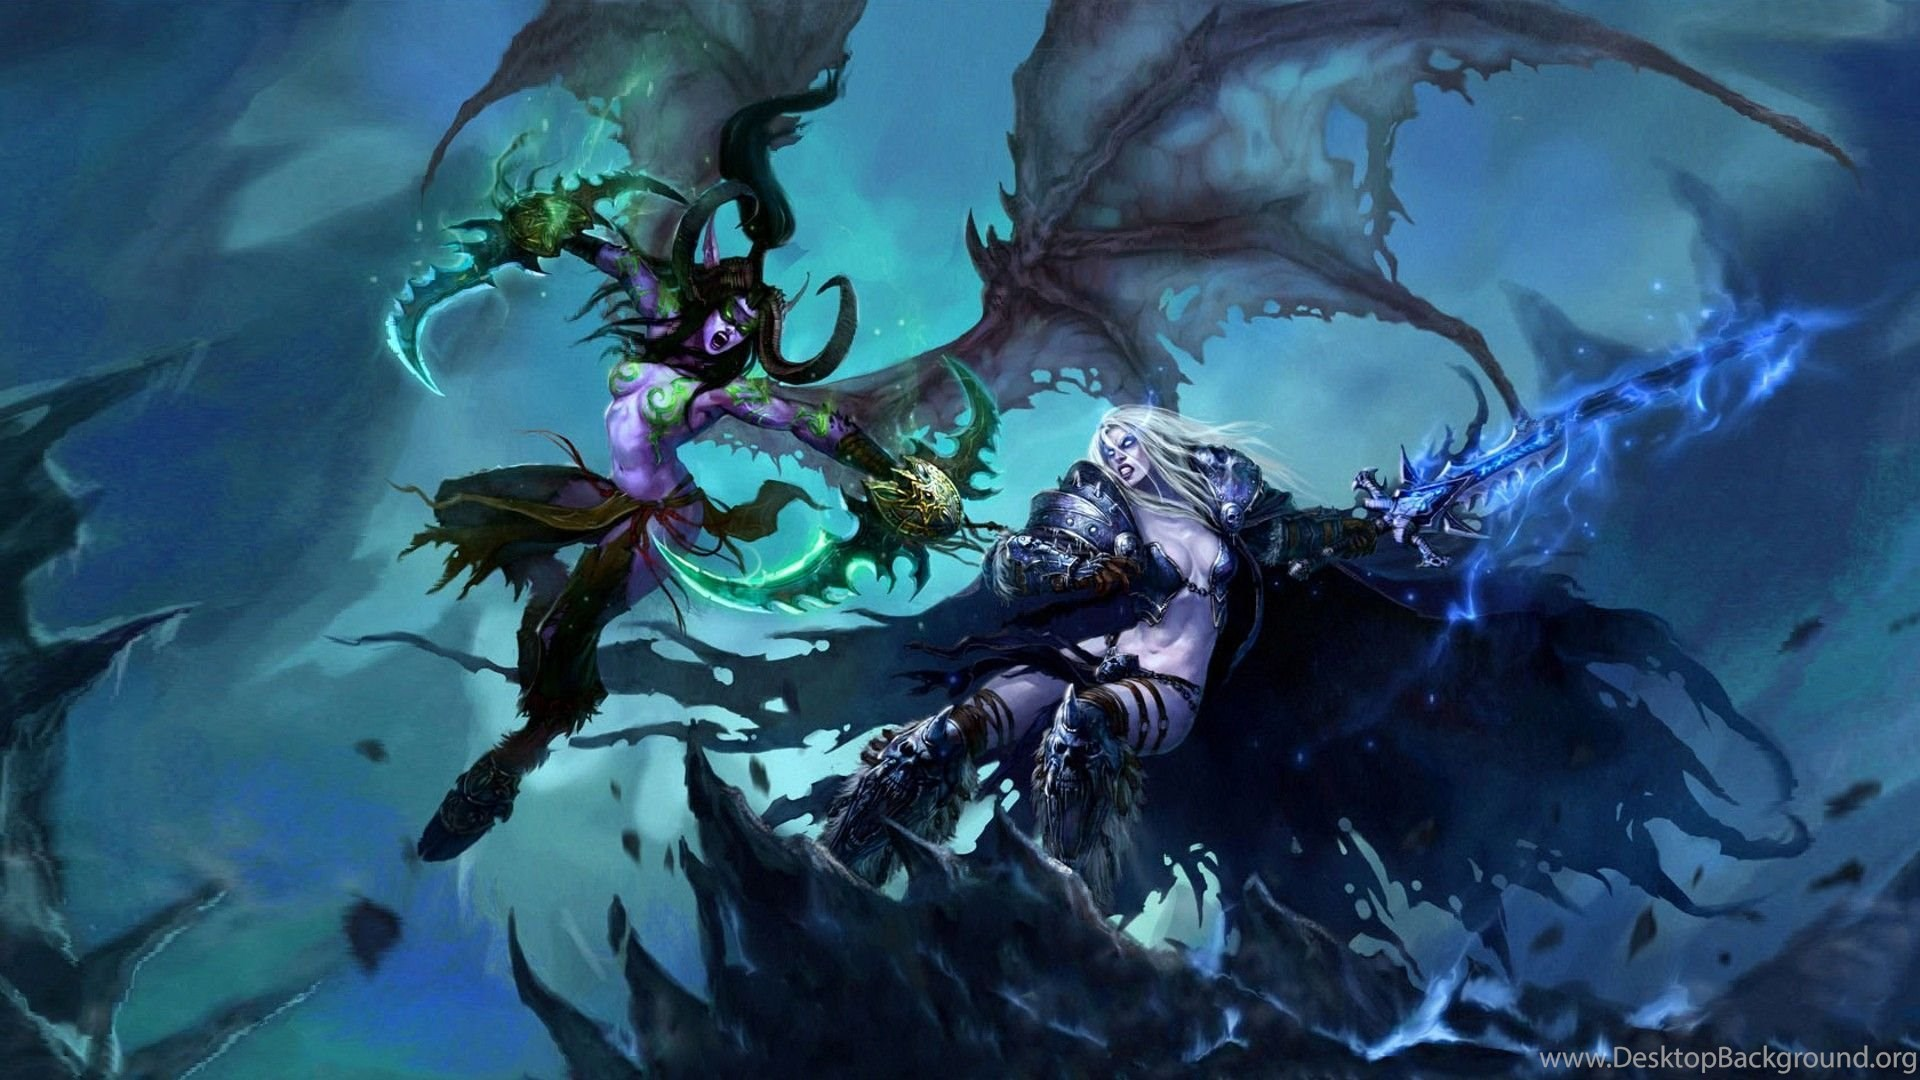 Illidan Vs Sylvanas World Of Warcraft Wallpapers Free Wide Hd